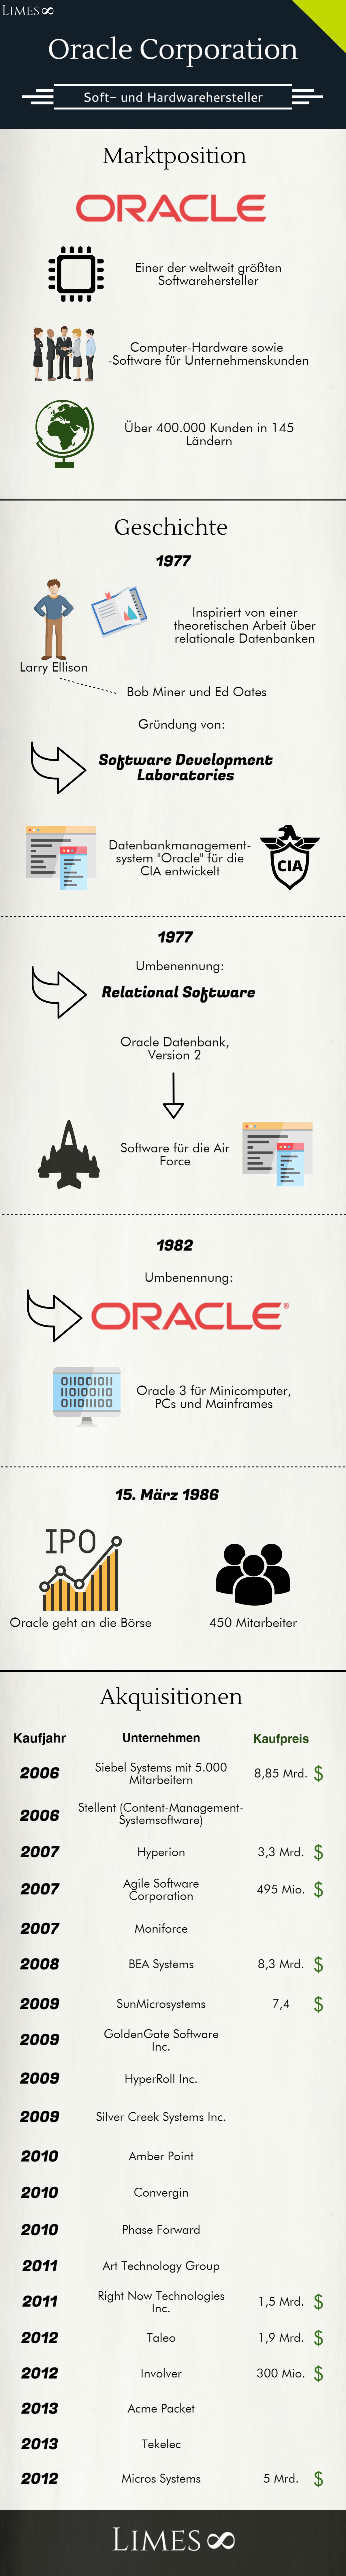 Infografik über die Oracle Corporation